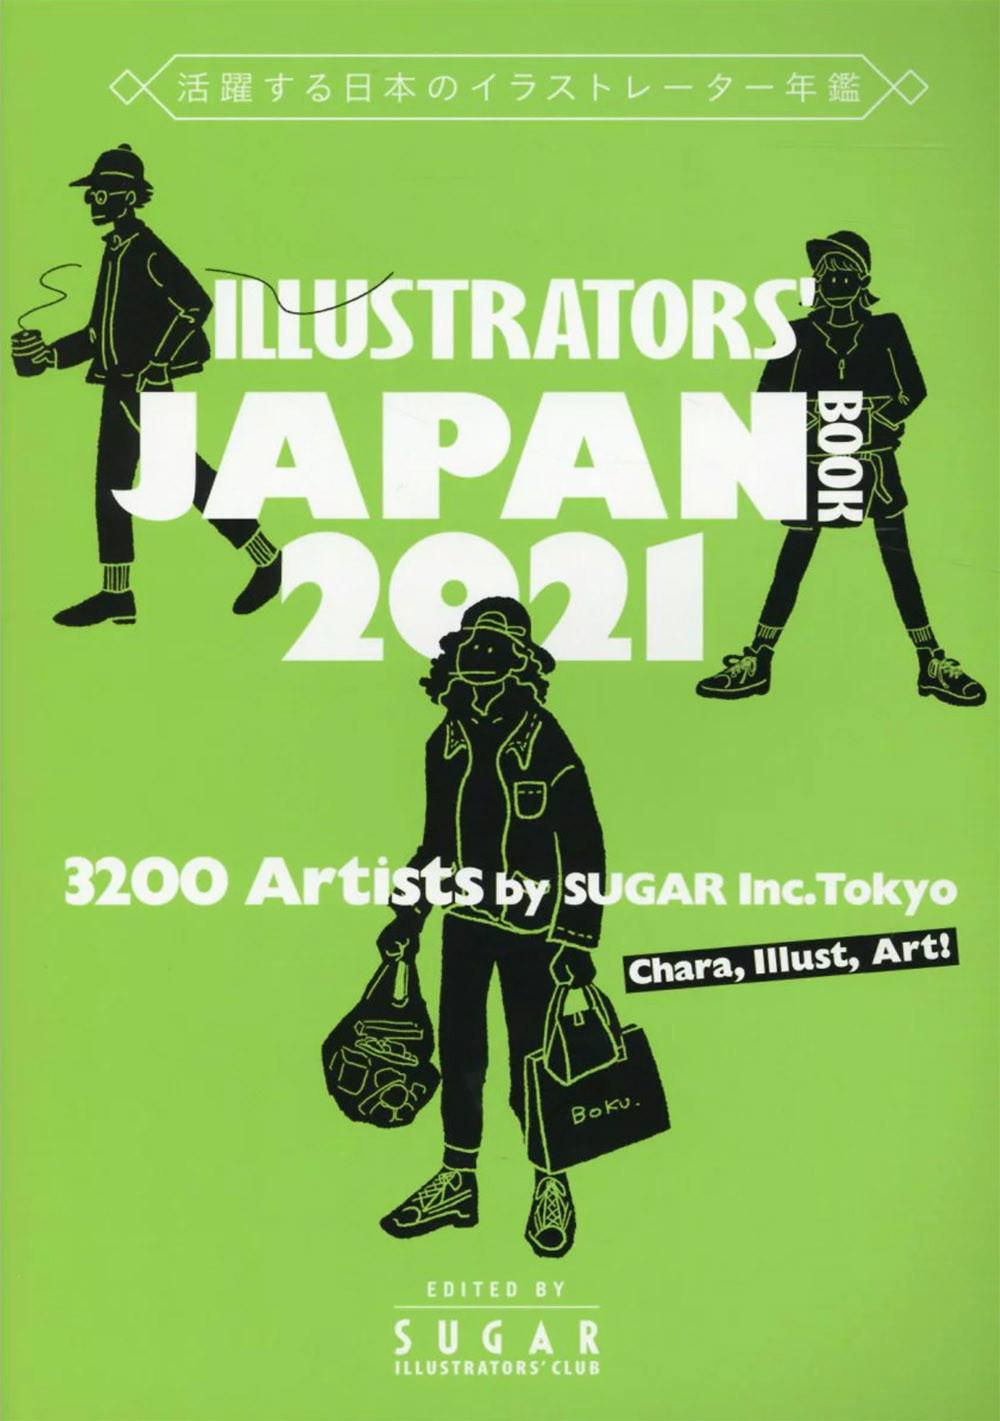 ILLUSTRATORS' JAPAN -活躍する日本のイラストレーター年鑑 2021